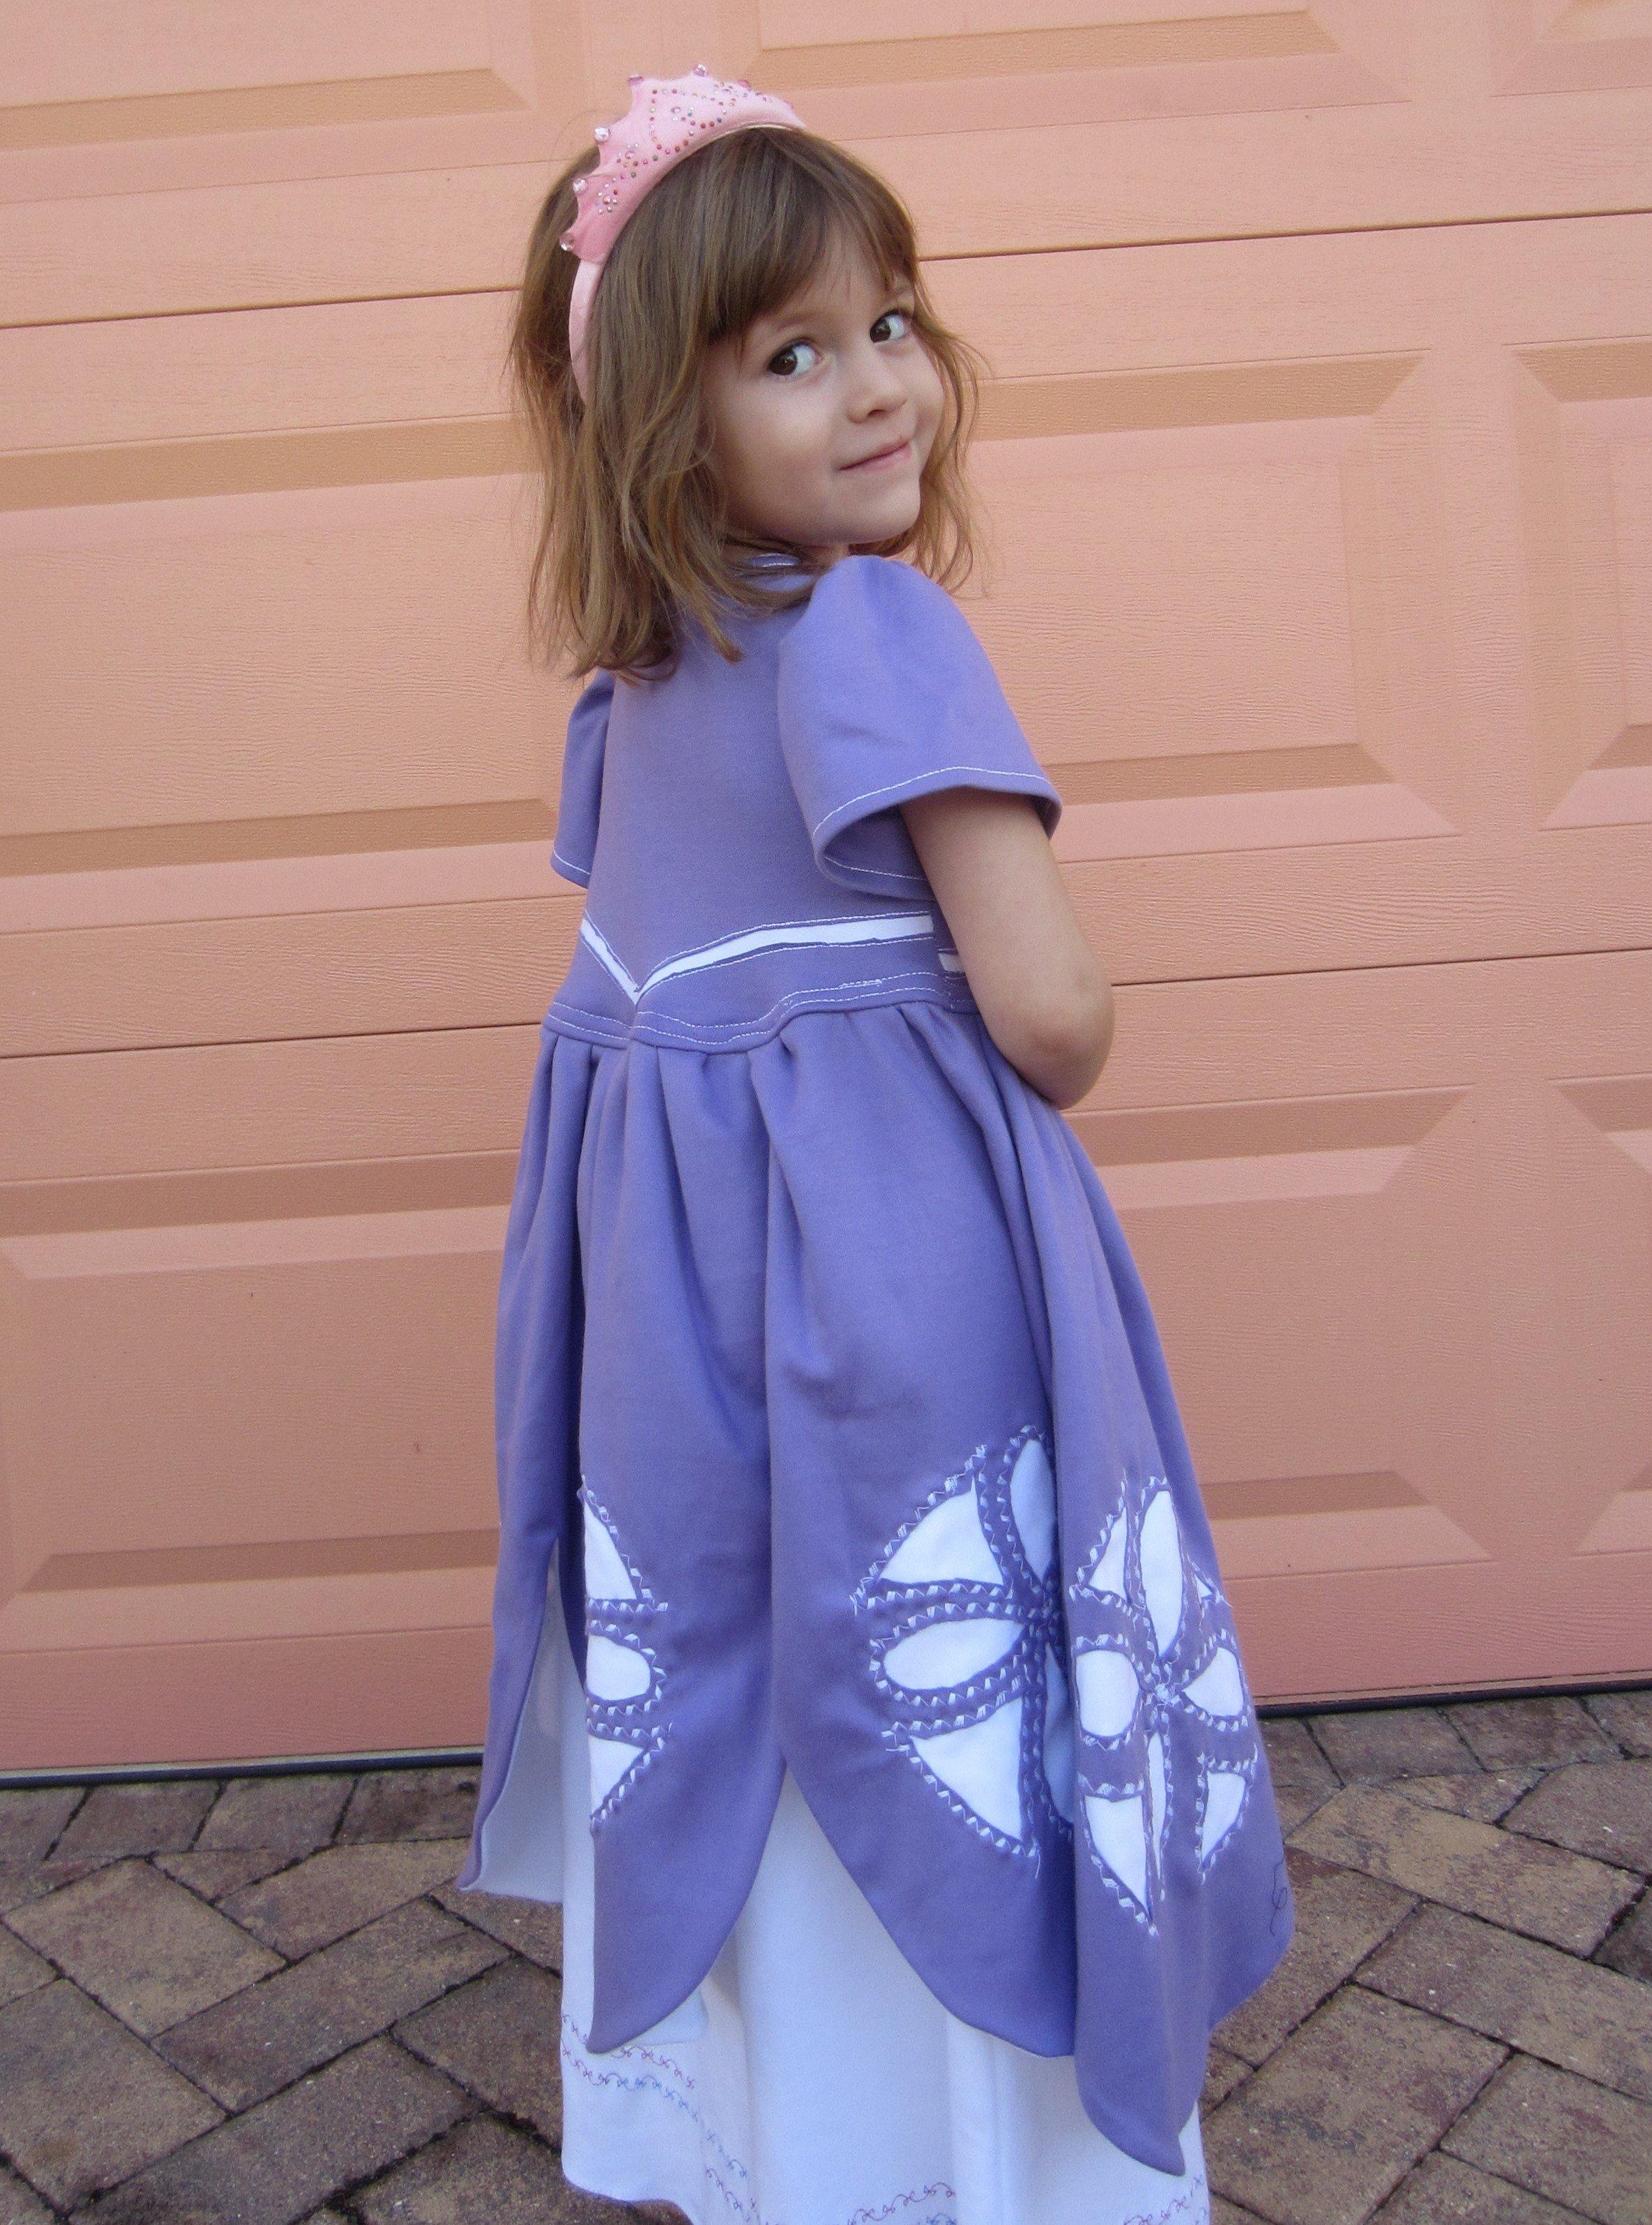 Sofia the First: Reverse Applique Knit Dress